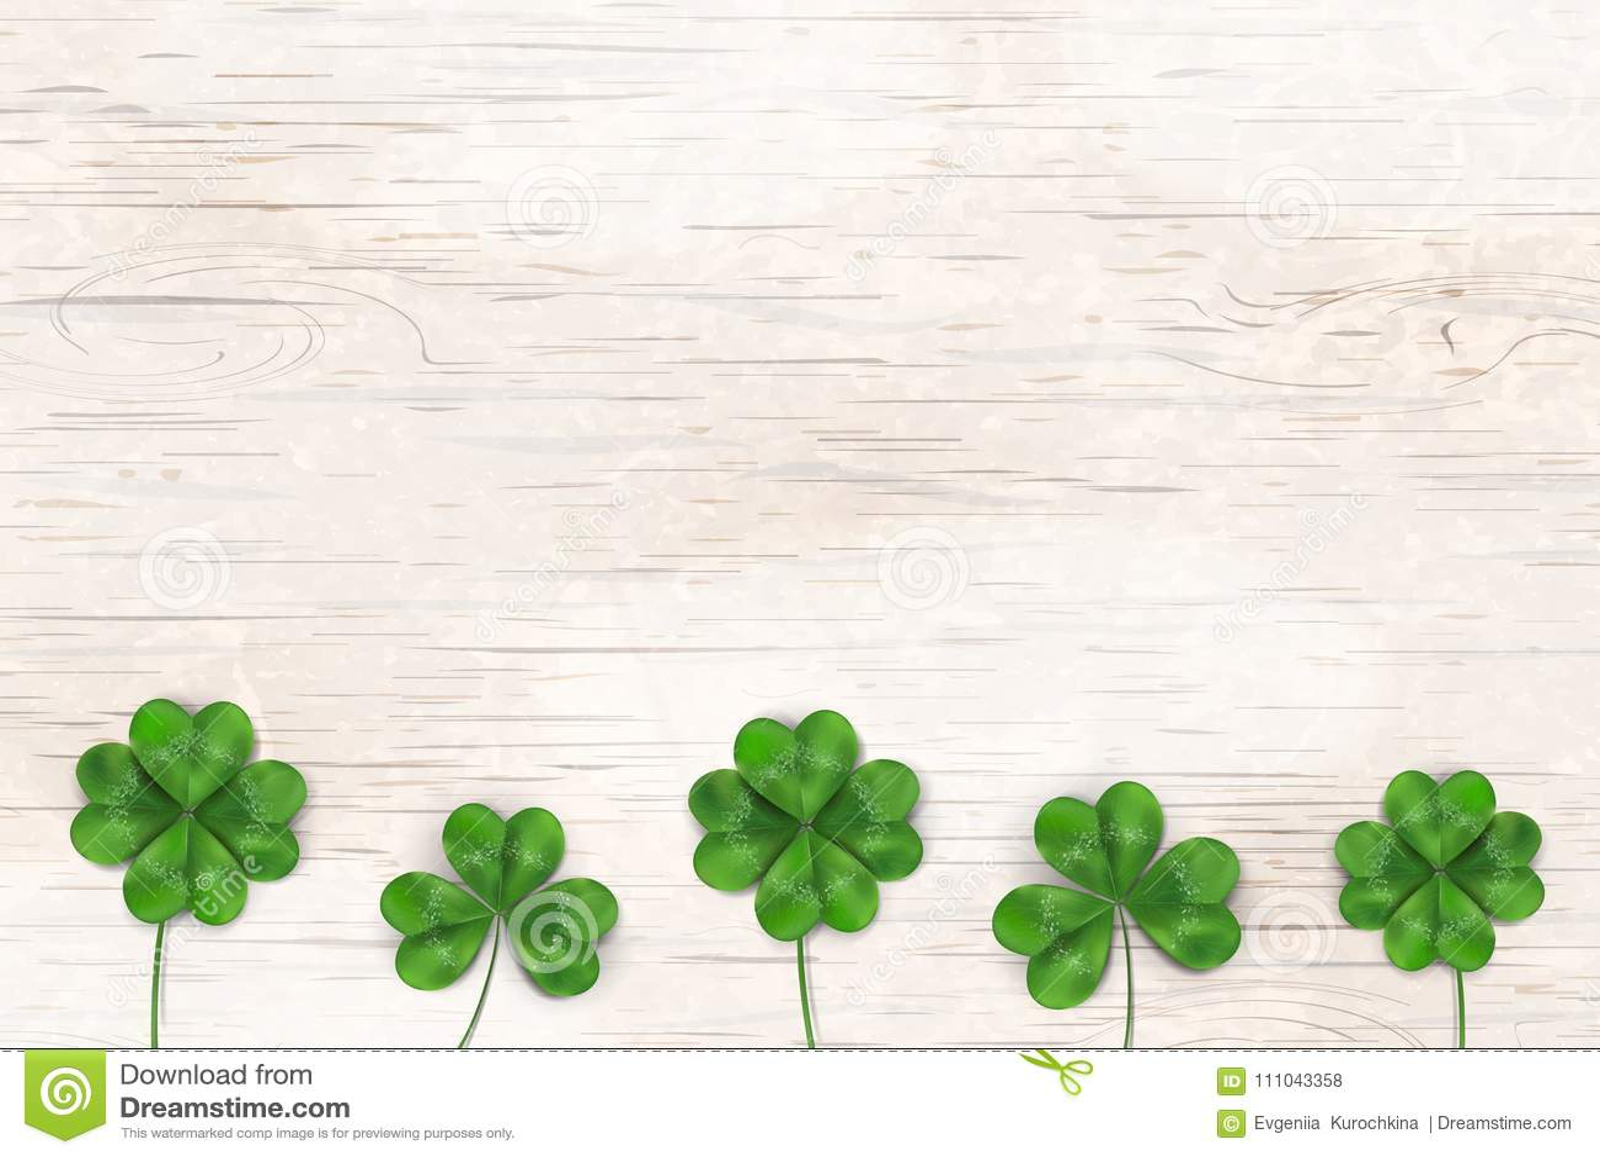 HAPPY ST PATRICKS DAY FLAG 5/' x 3/' BLACK Saint Patrick Ireland Irish Shamrock